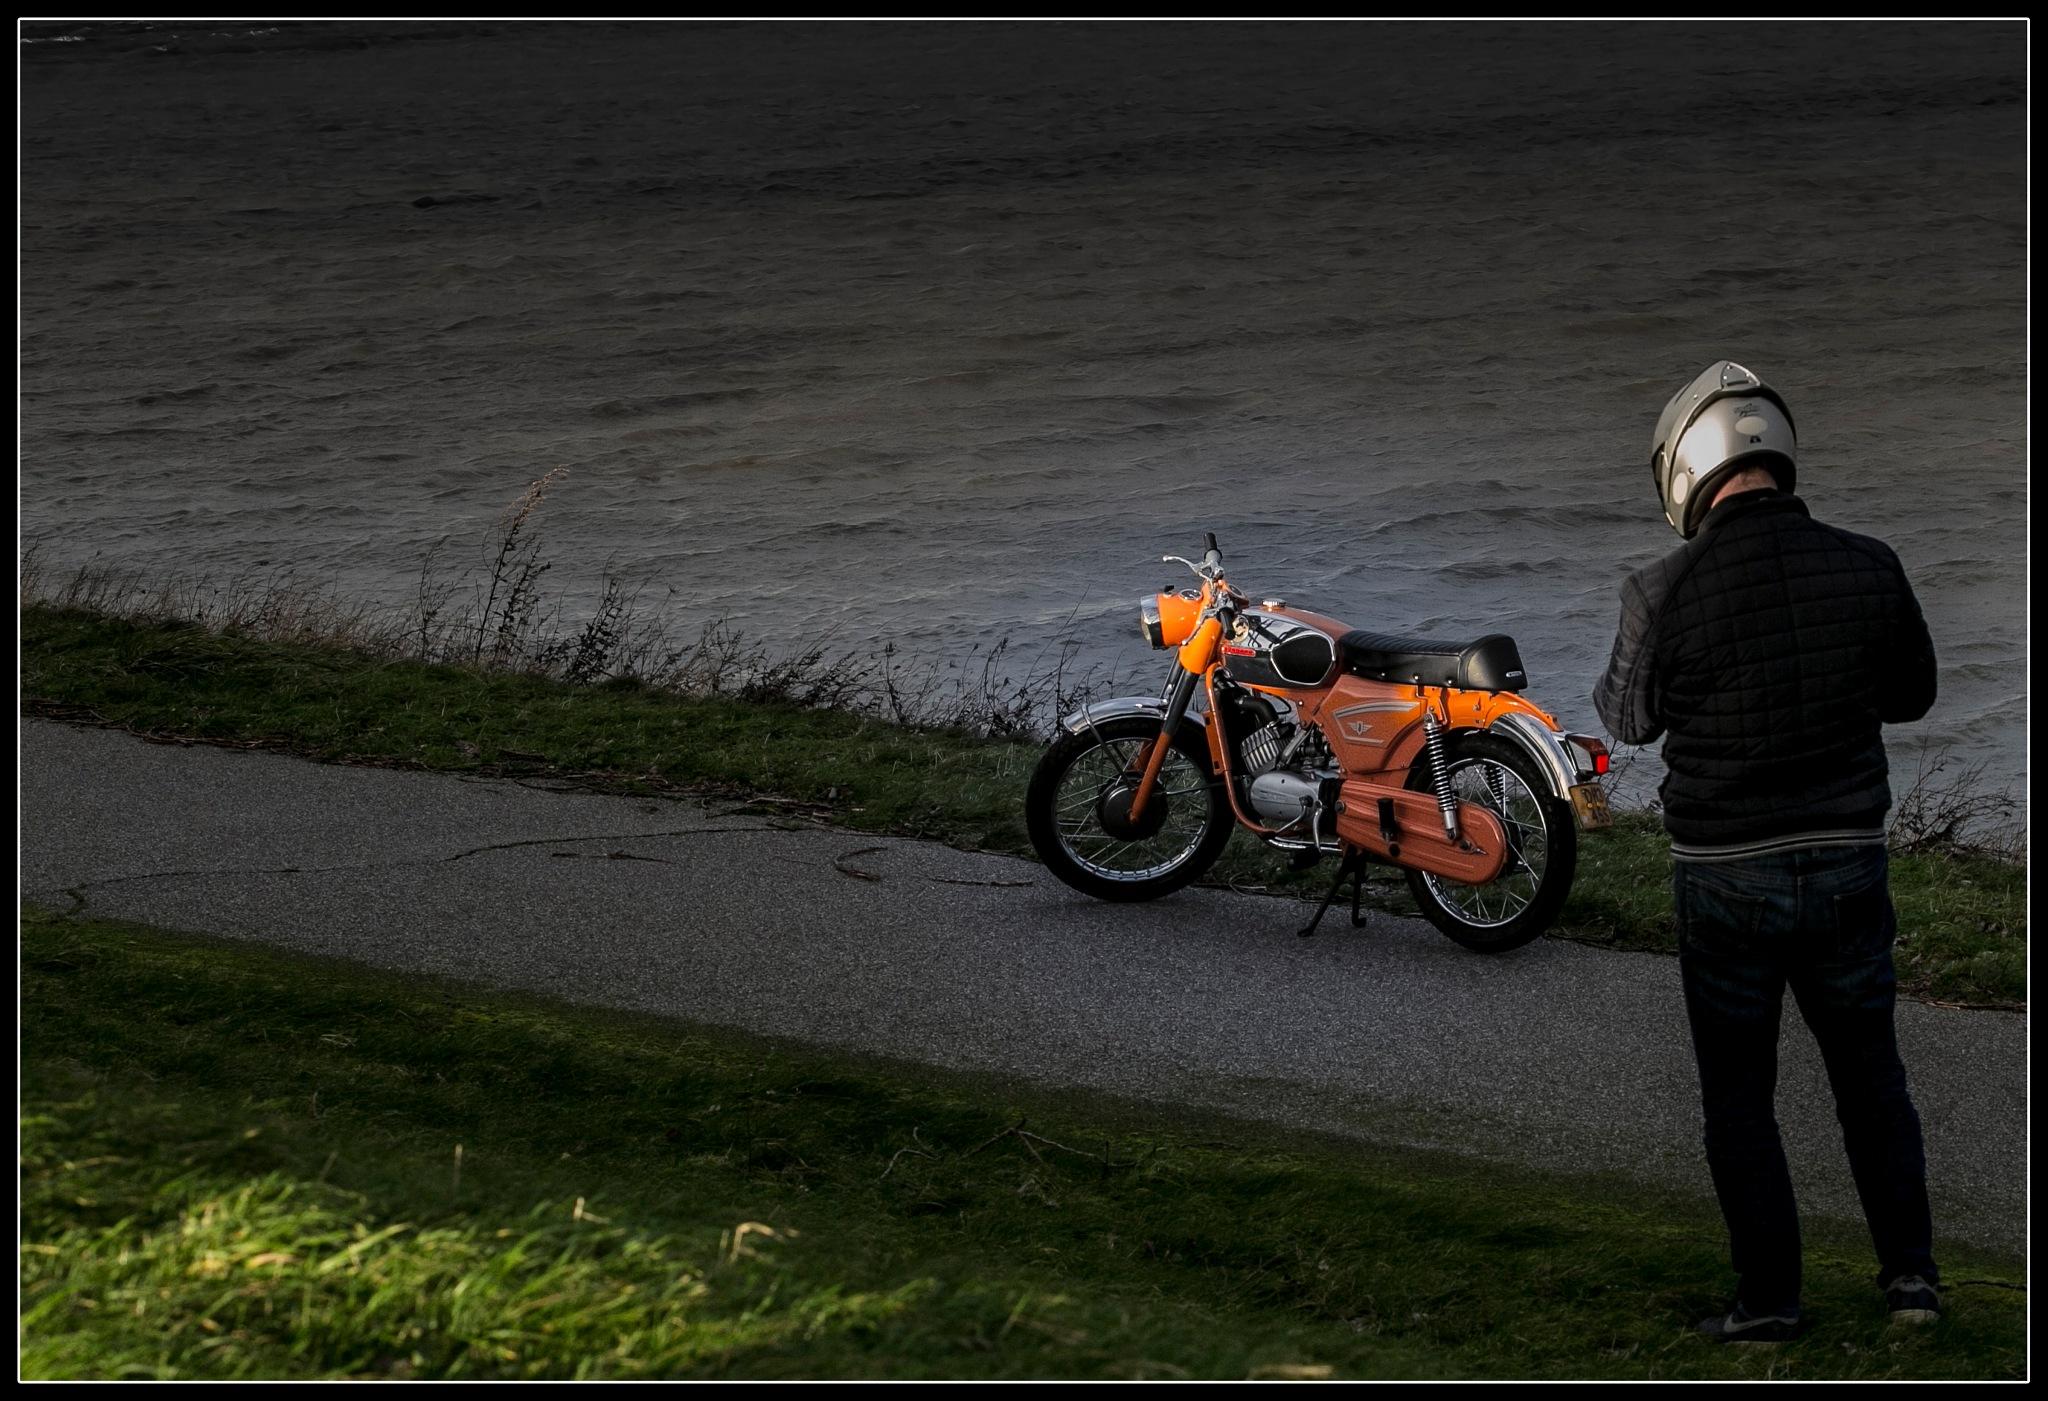 (P)ride and joy by ad.kesteloo